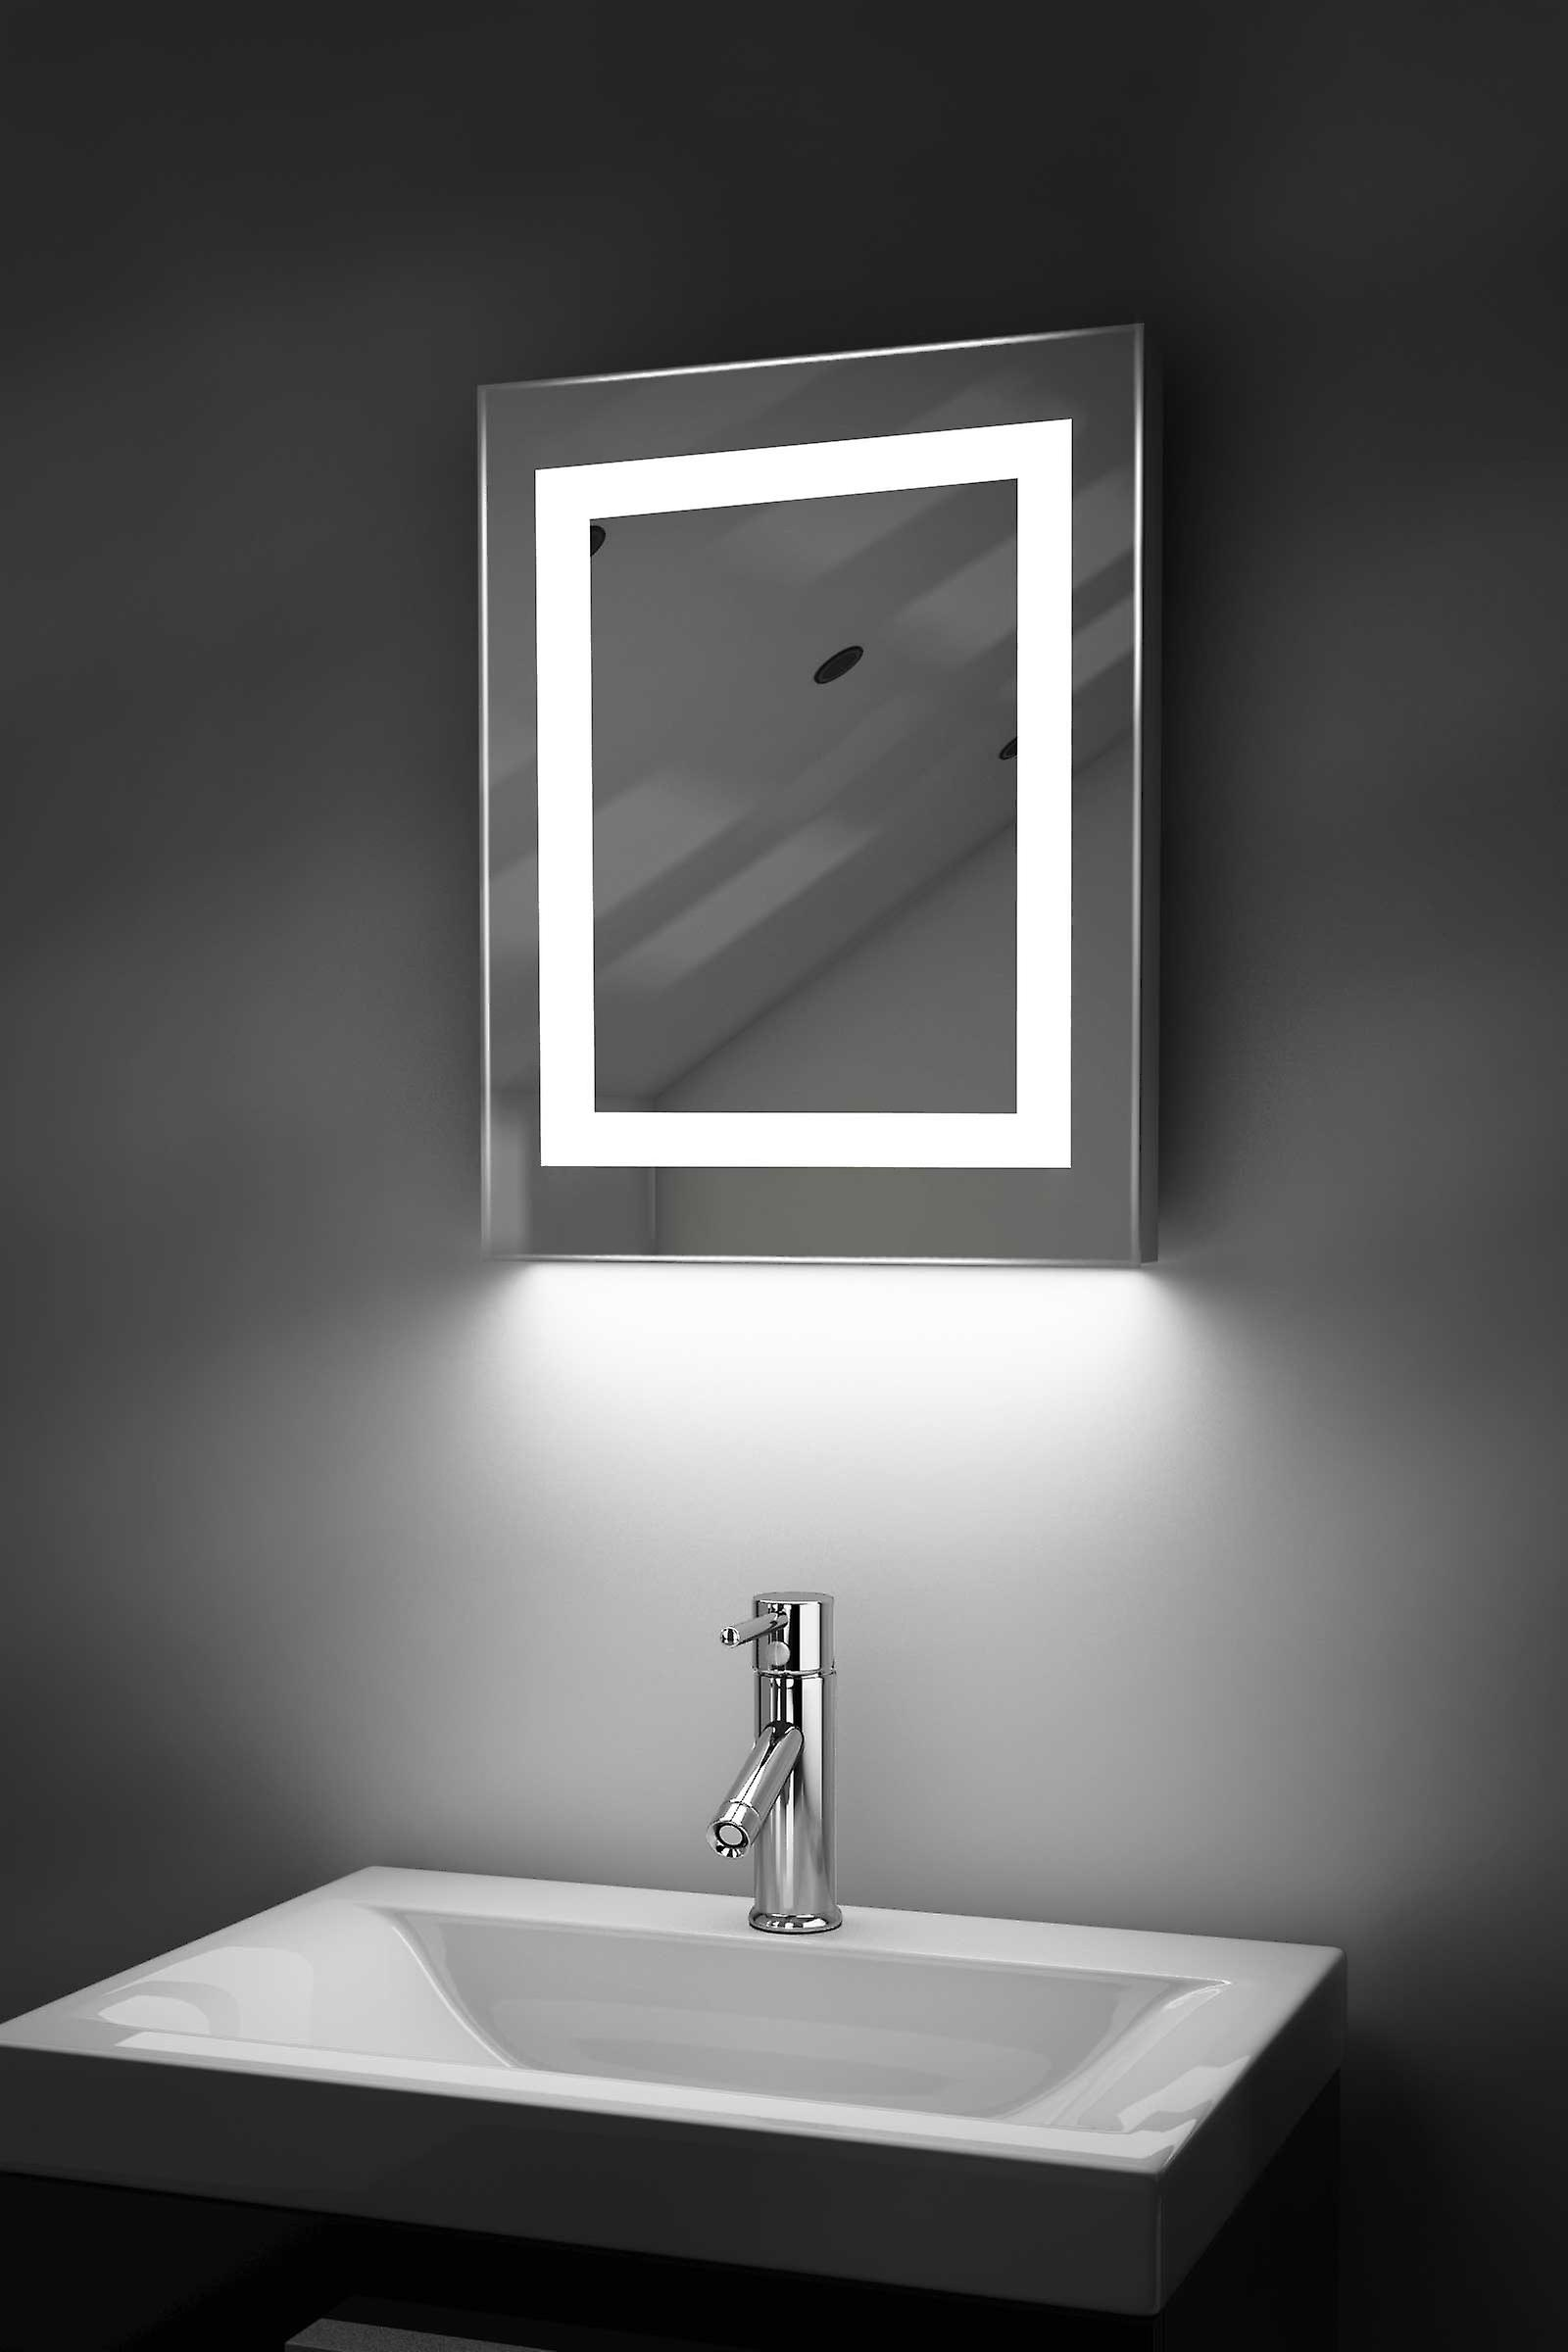 Auto Colour Change Bathroom Mirror With Demist Pad & Sensor k157irgb